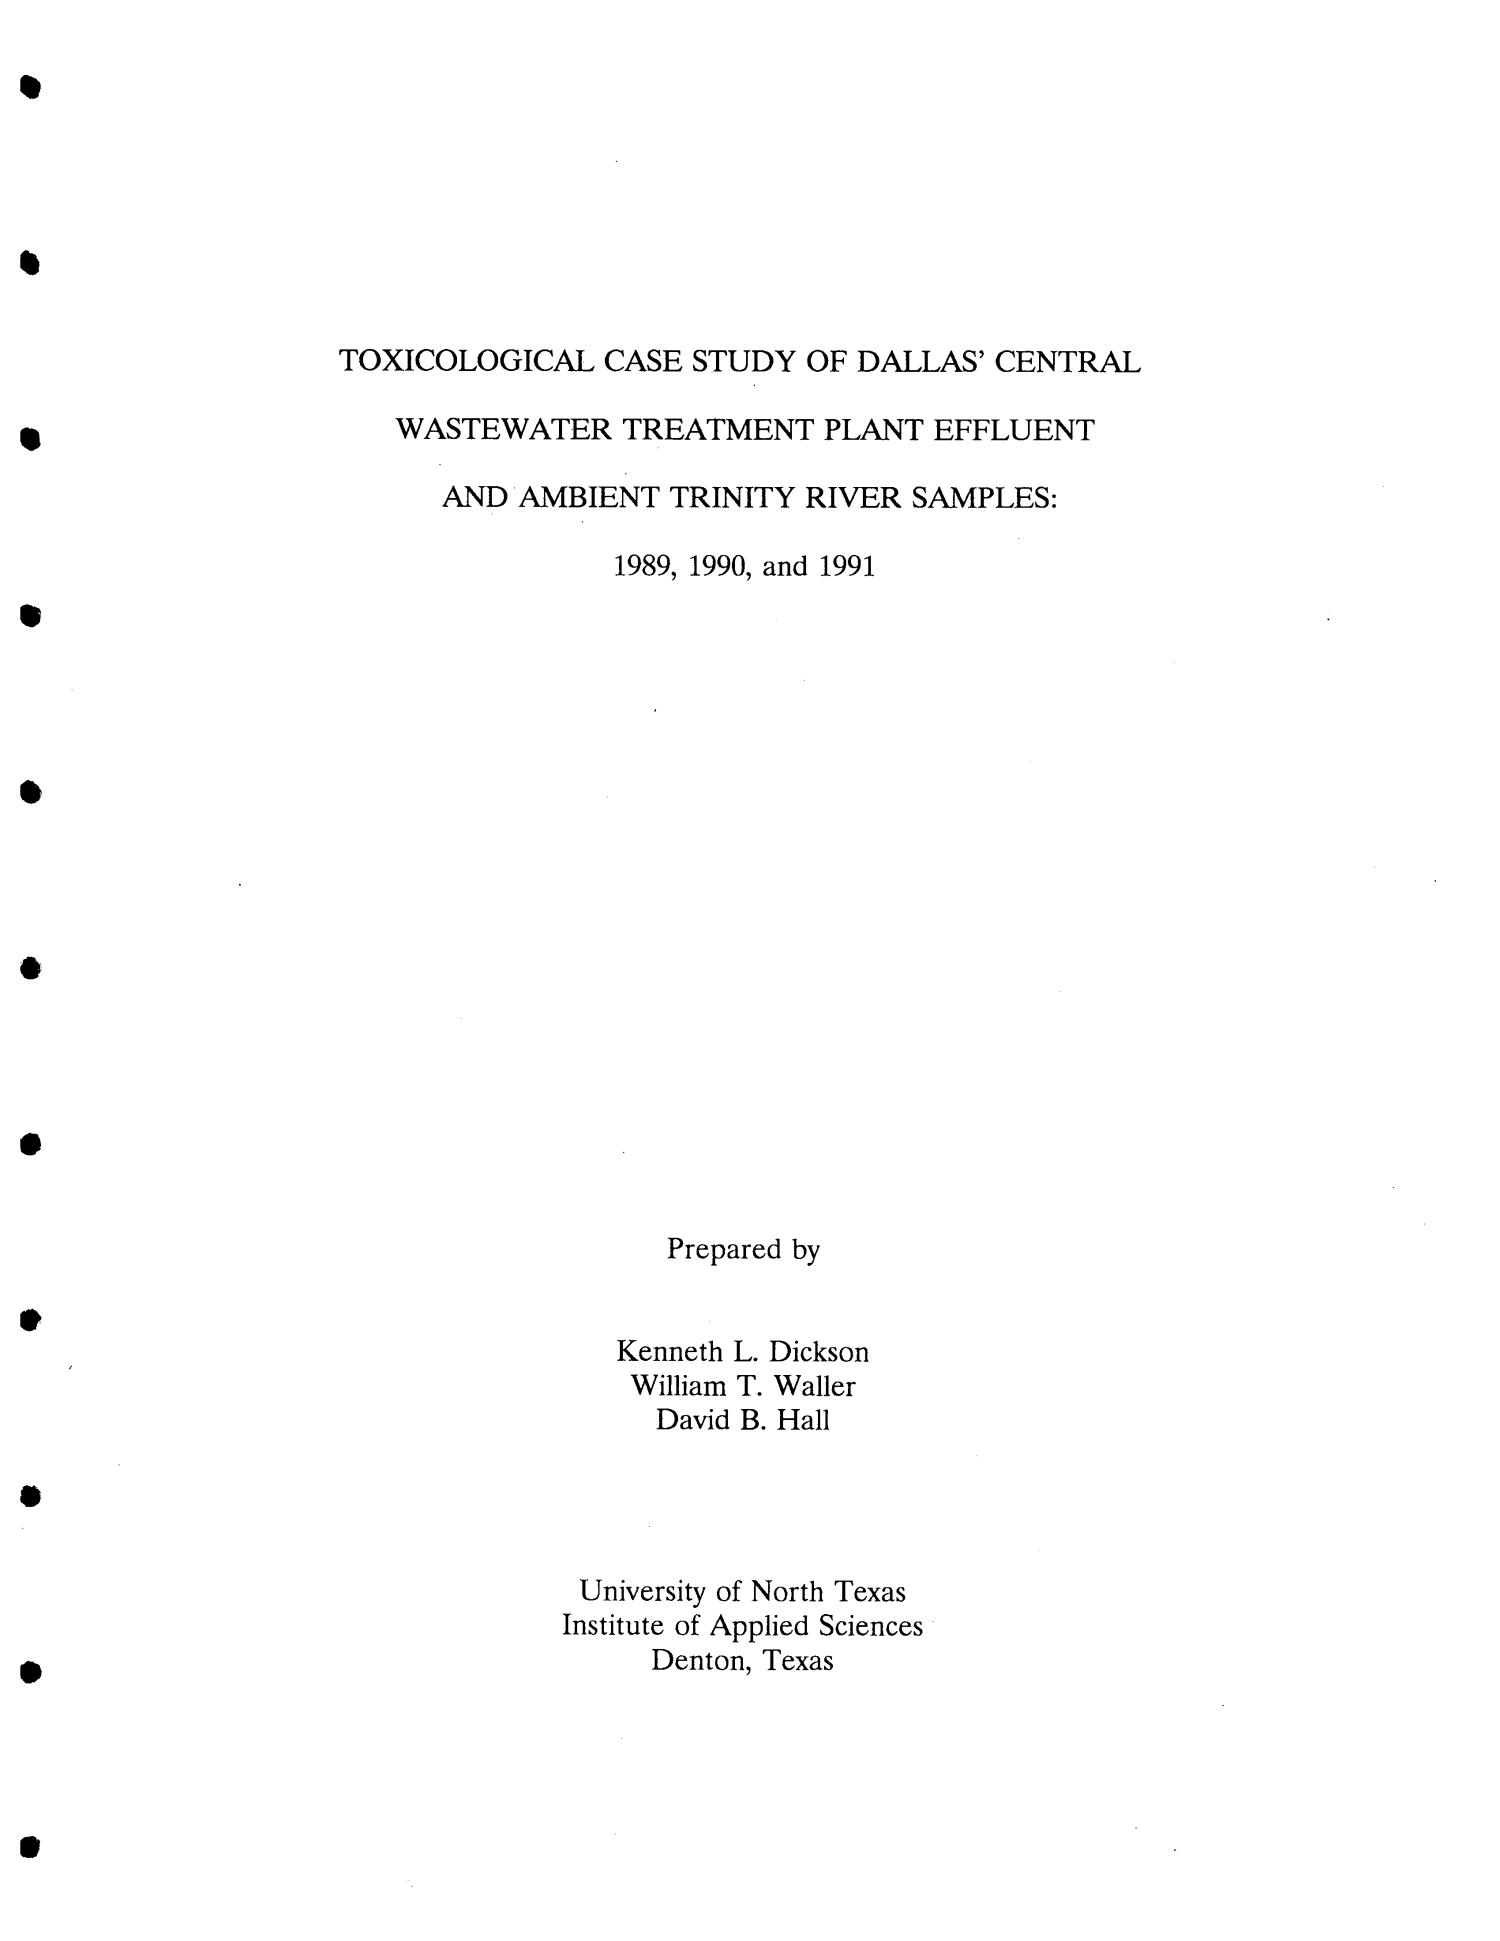 Dissertation binding service birmingham picture 1